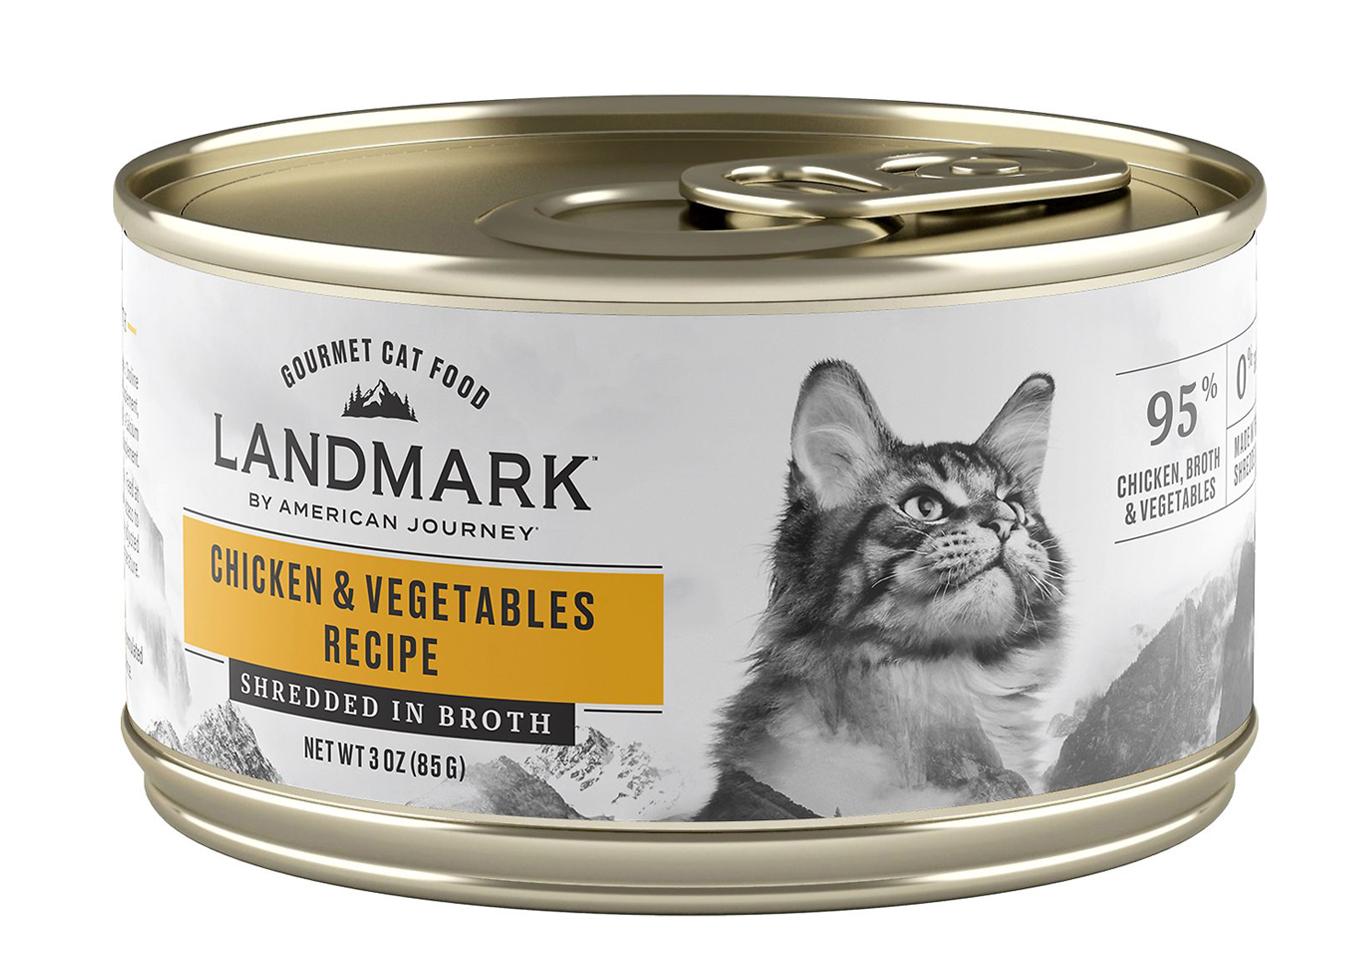 Landmark Chicken & Vegetables